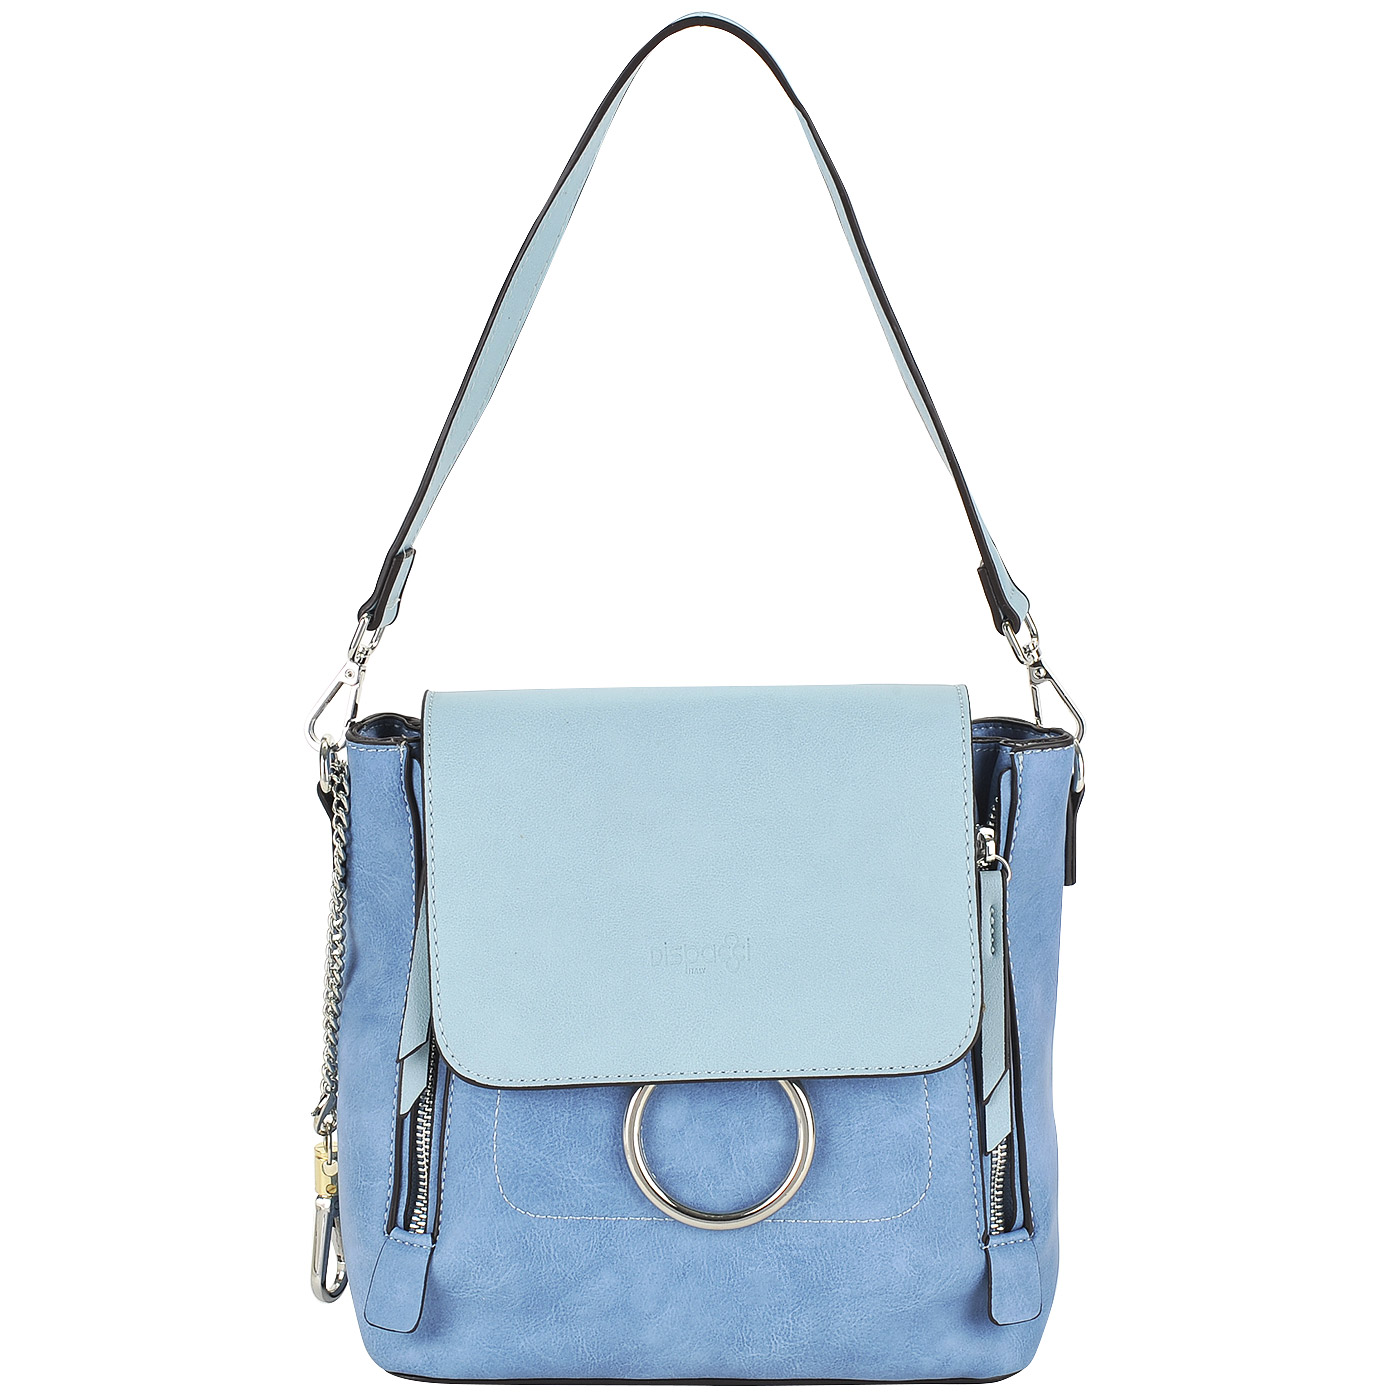 b55a4571f964 ... Практичная женская сумка-рюкзак из экокожи синего цвета Dispacci ...